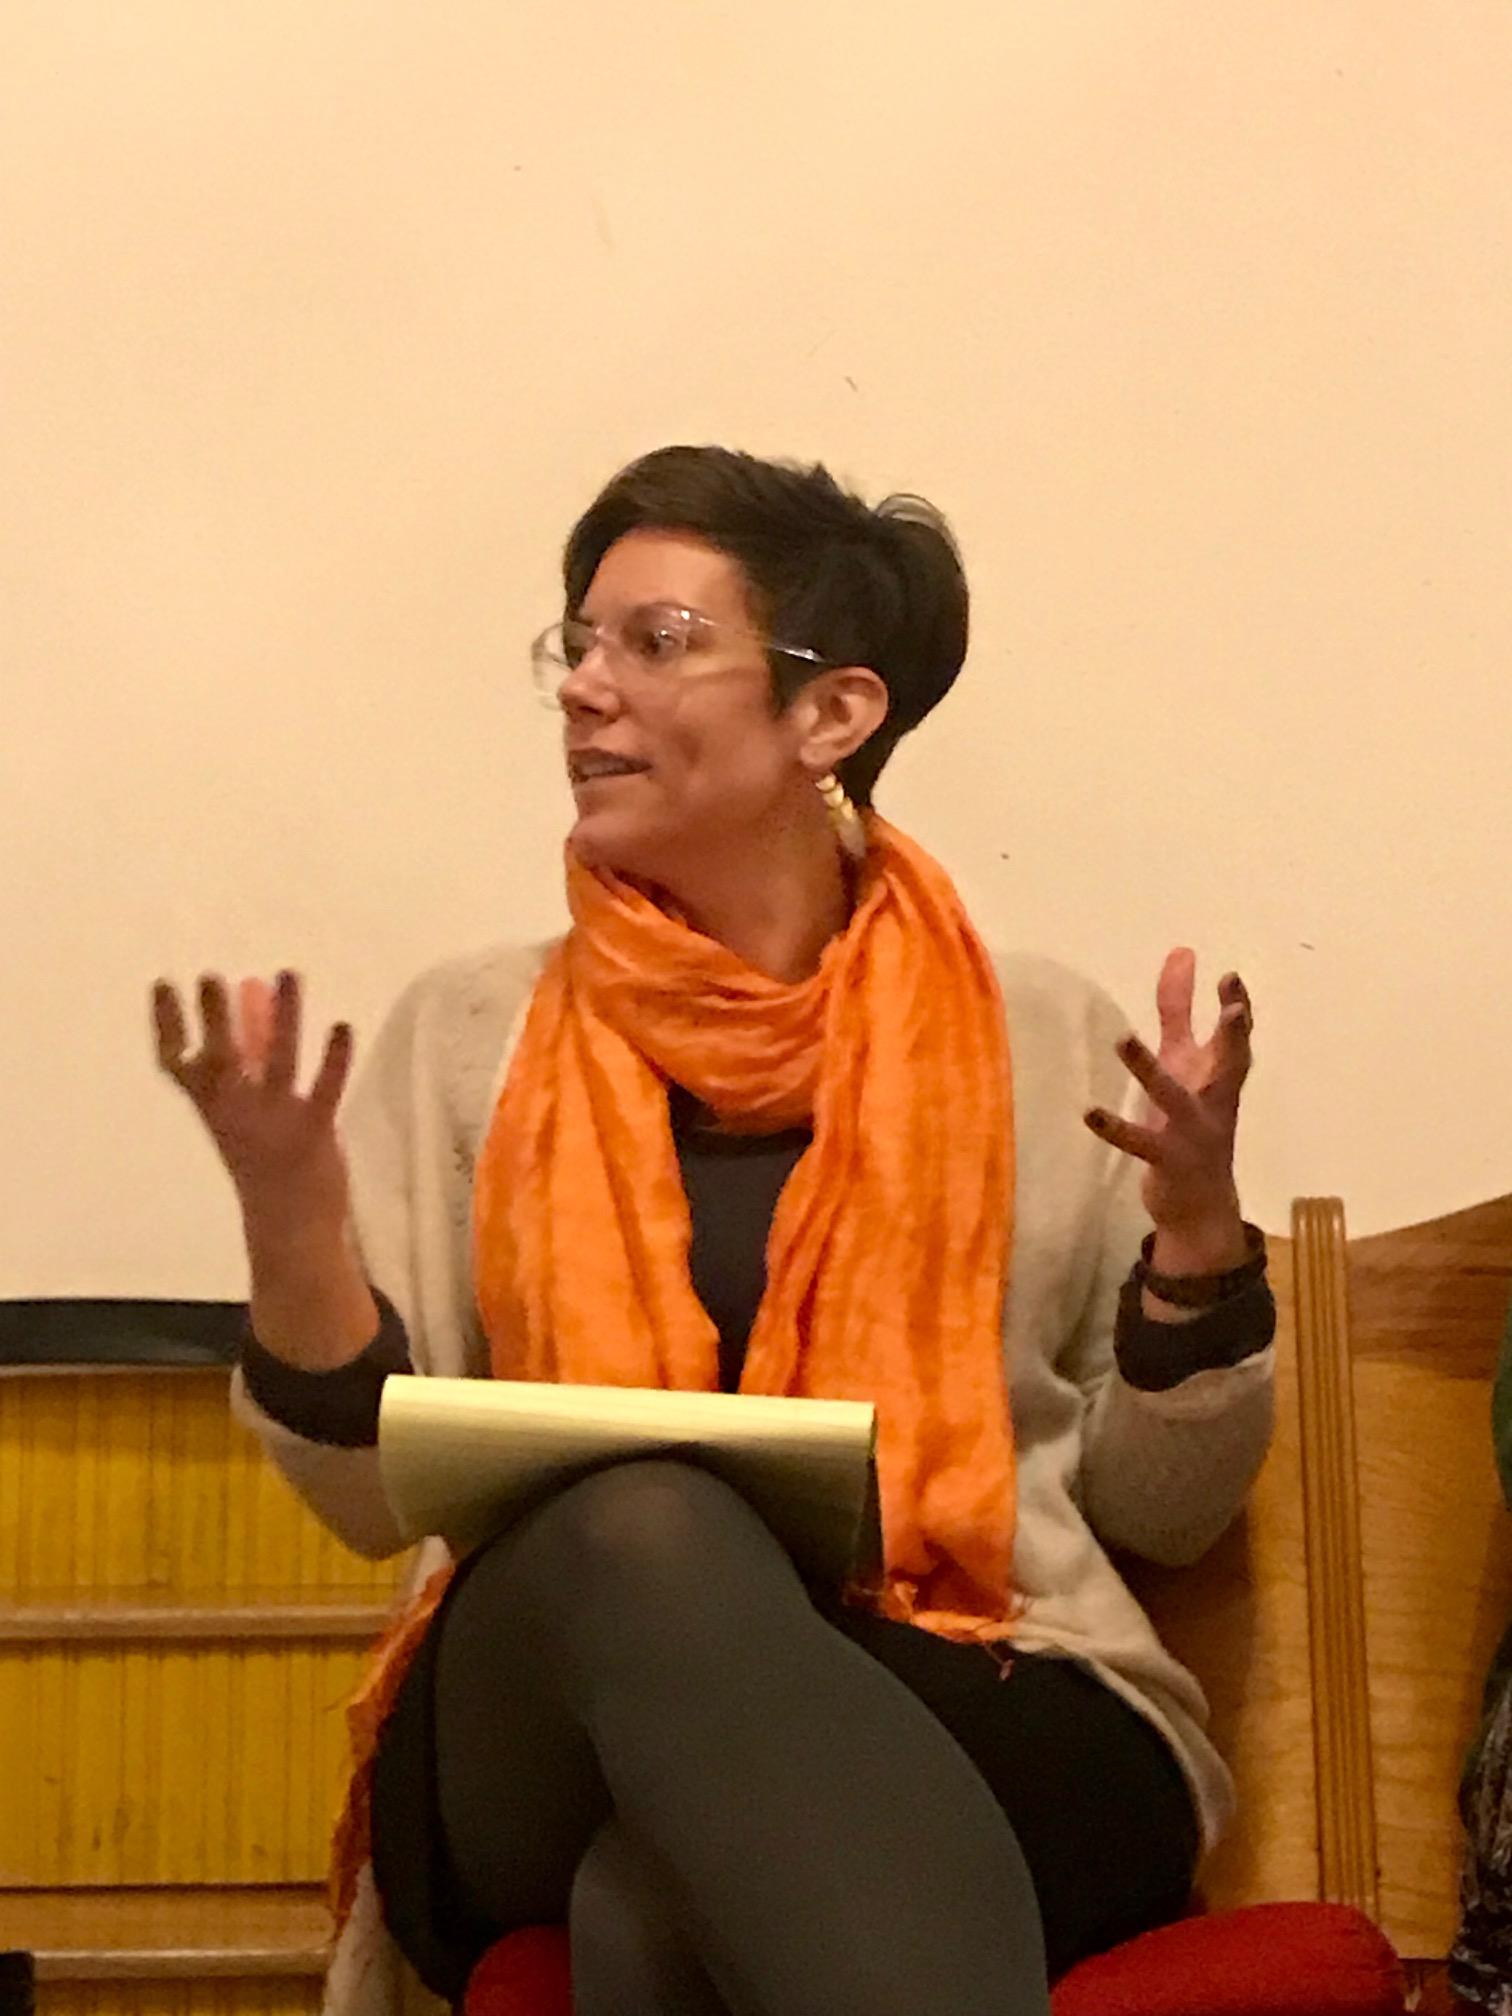 Gwen Pokalo, Moderator, of the Center for Women in Enterprise